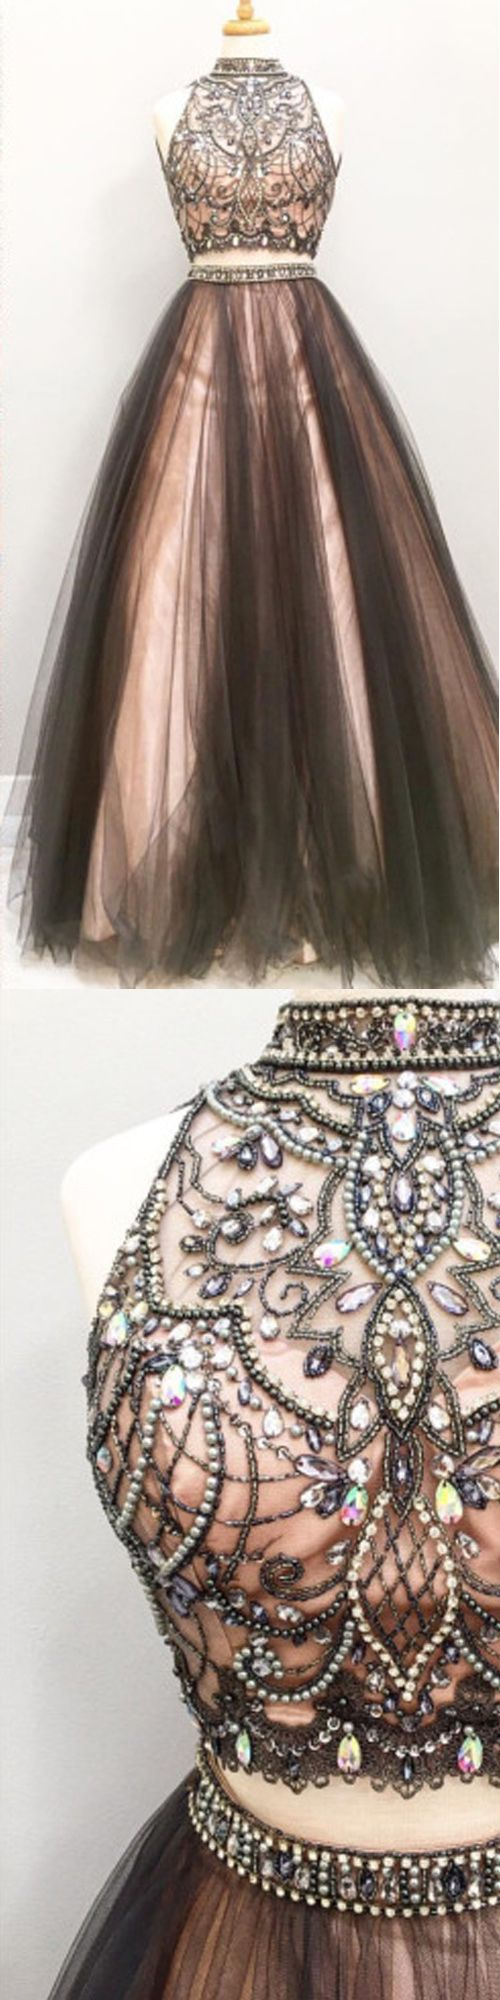 Pretty Prom Dress,High-Neck Prom Dress,Beading Prom Dress,Tulle Prom Dress